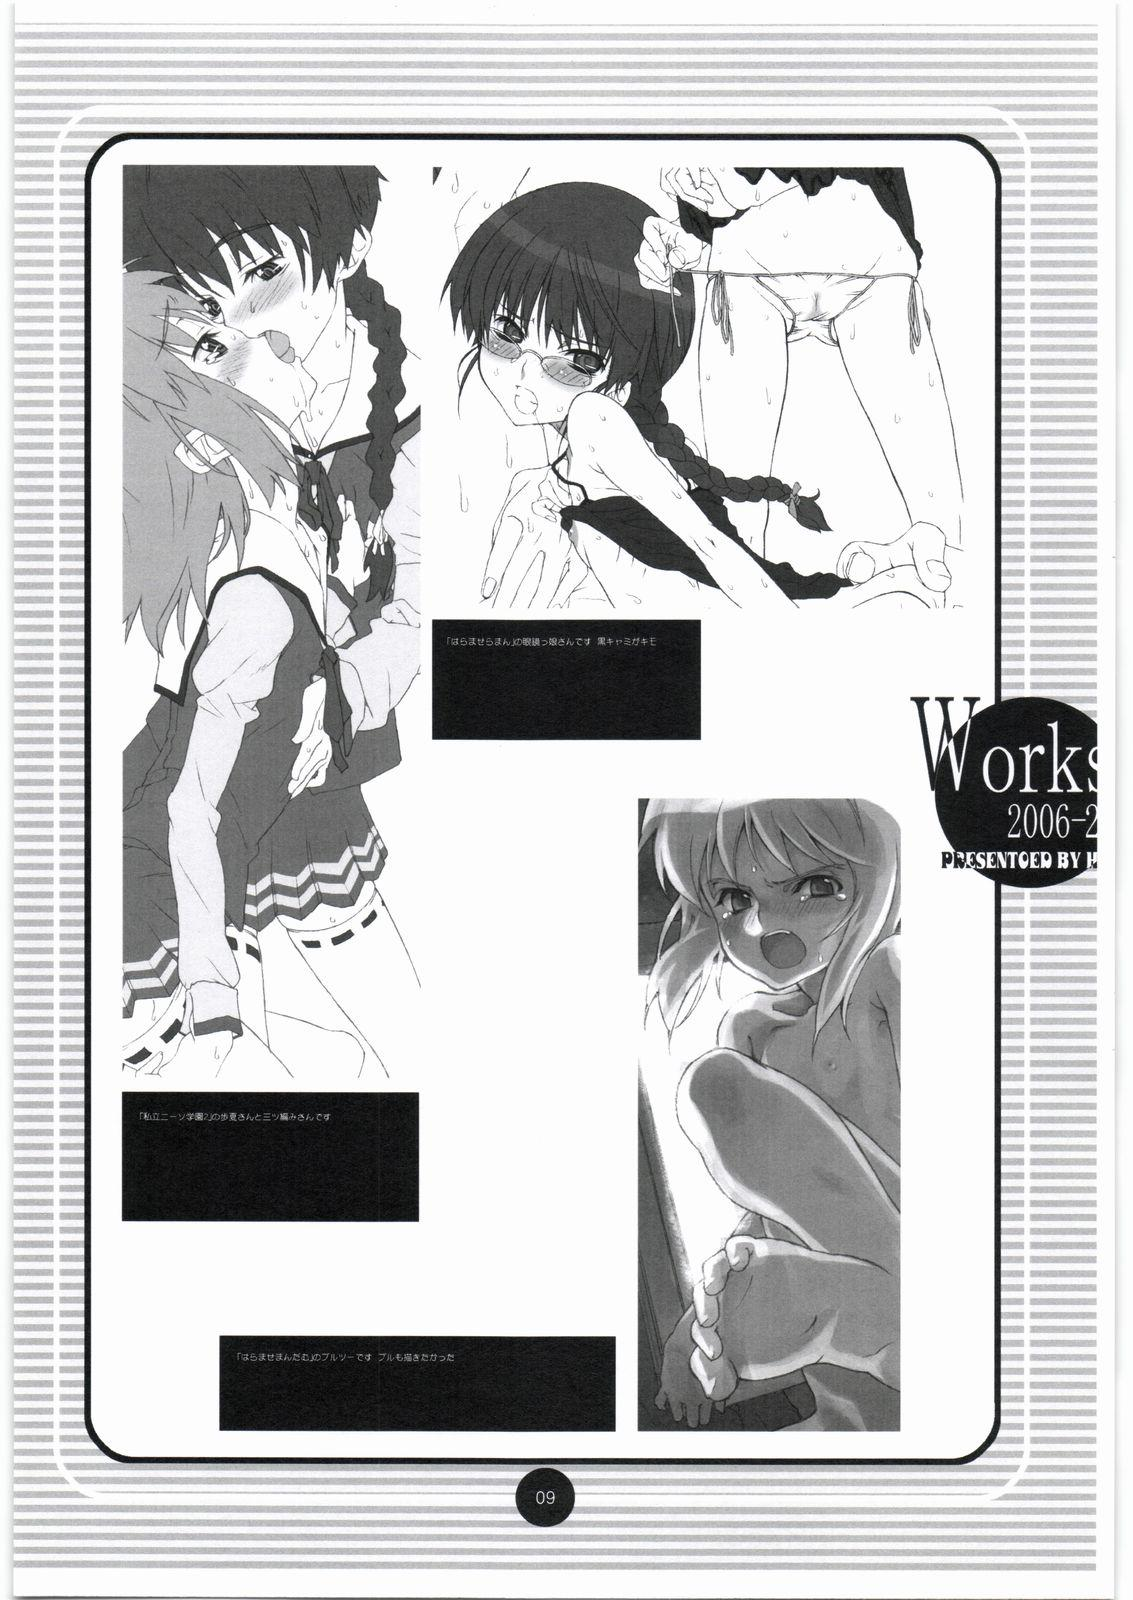 Works 2006-2007 5